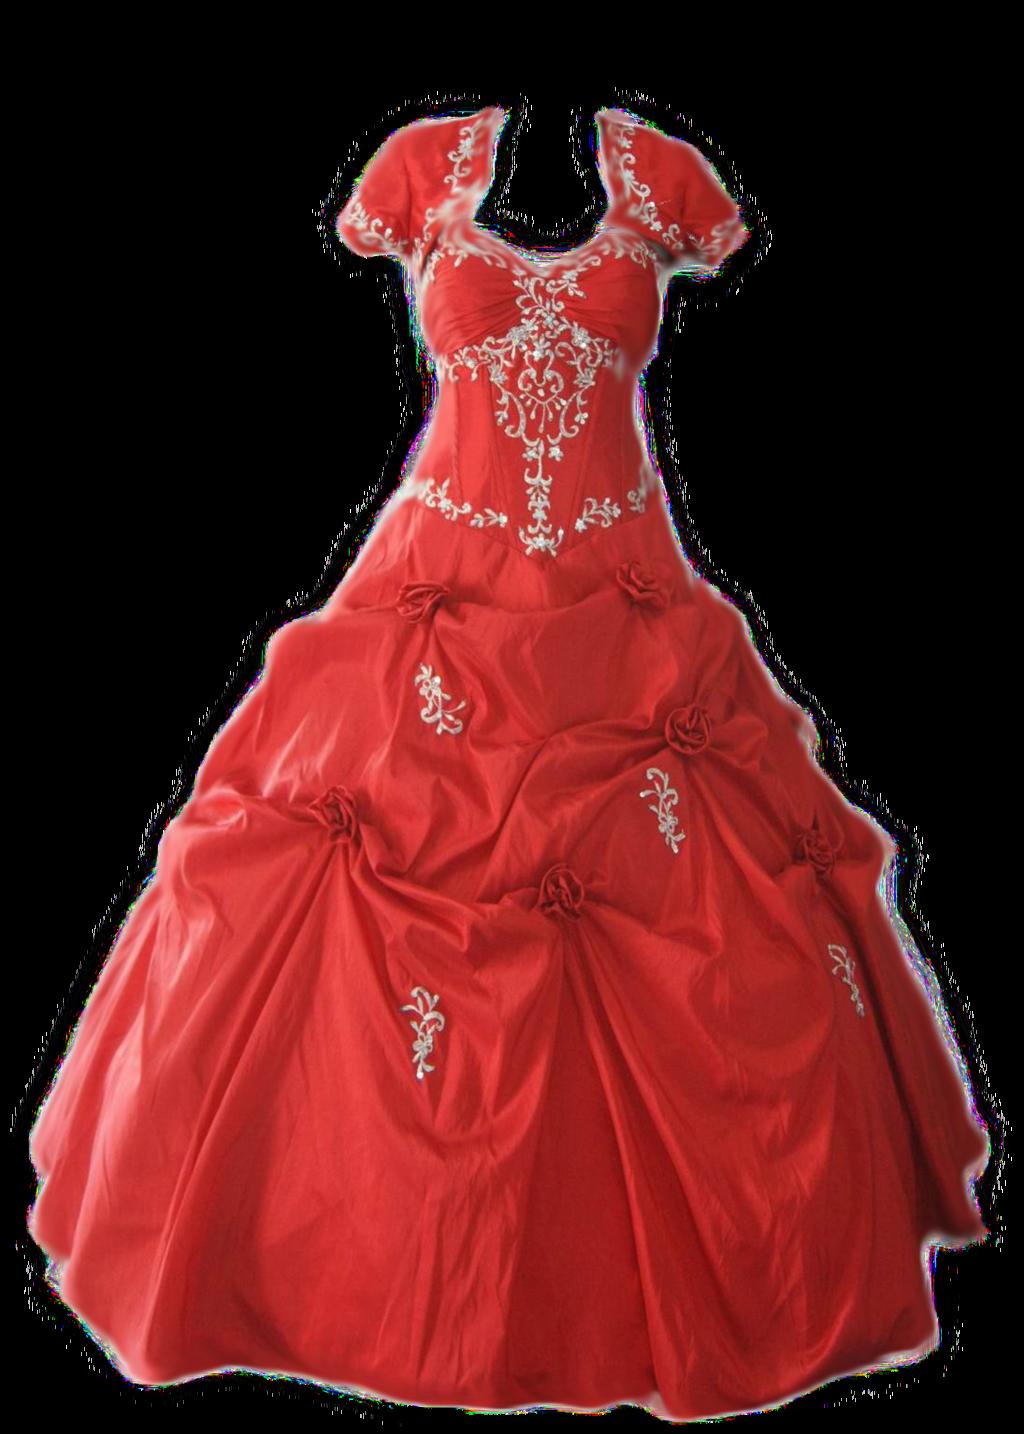 Vestimentaires pinterest fantasy gowns. Dress clipart nice